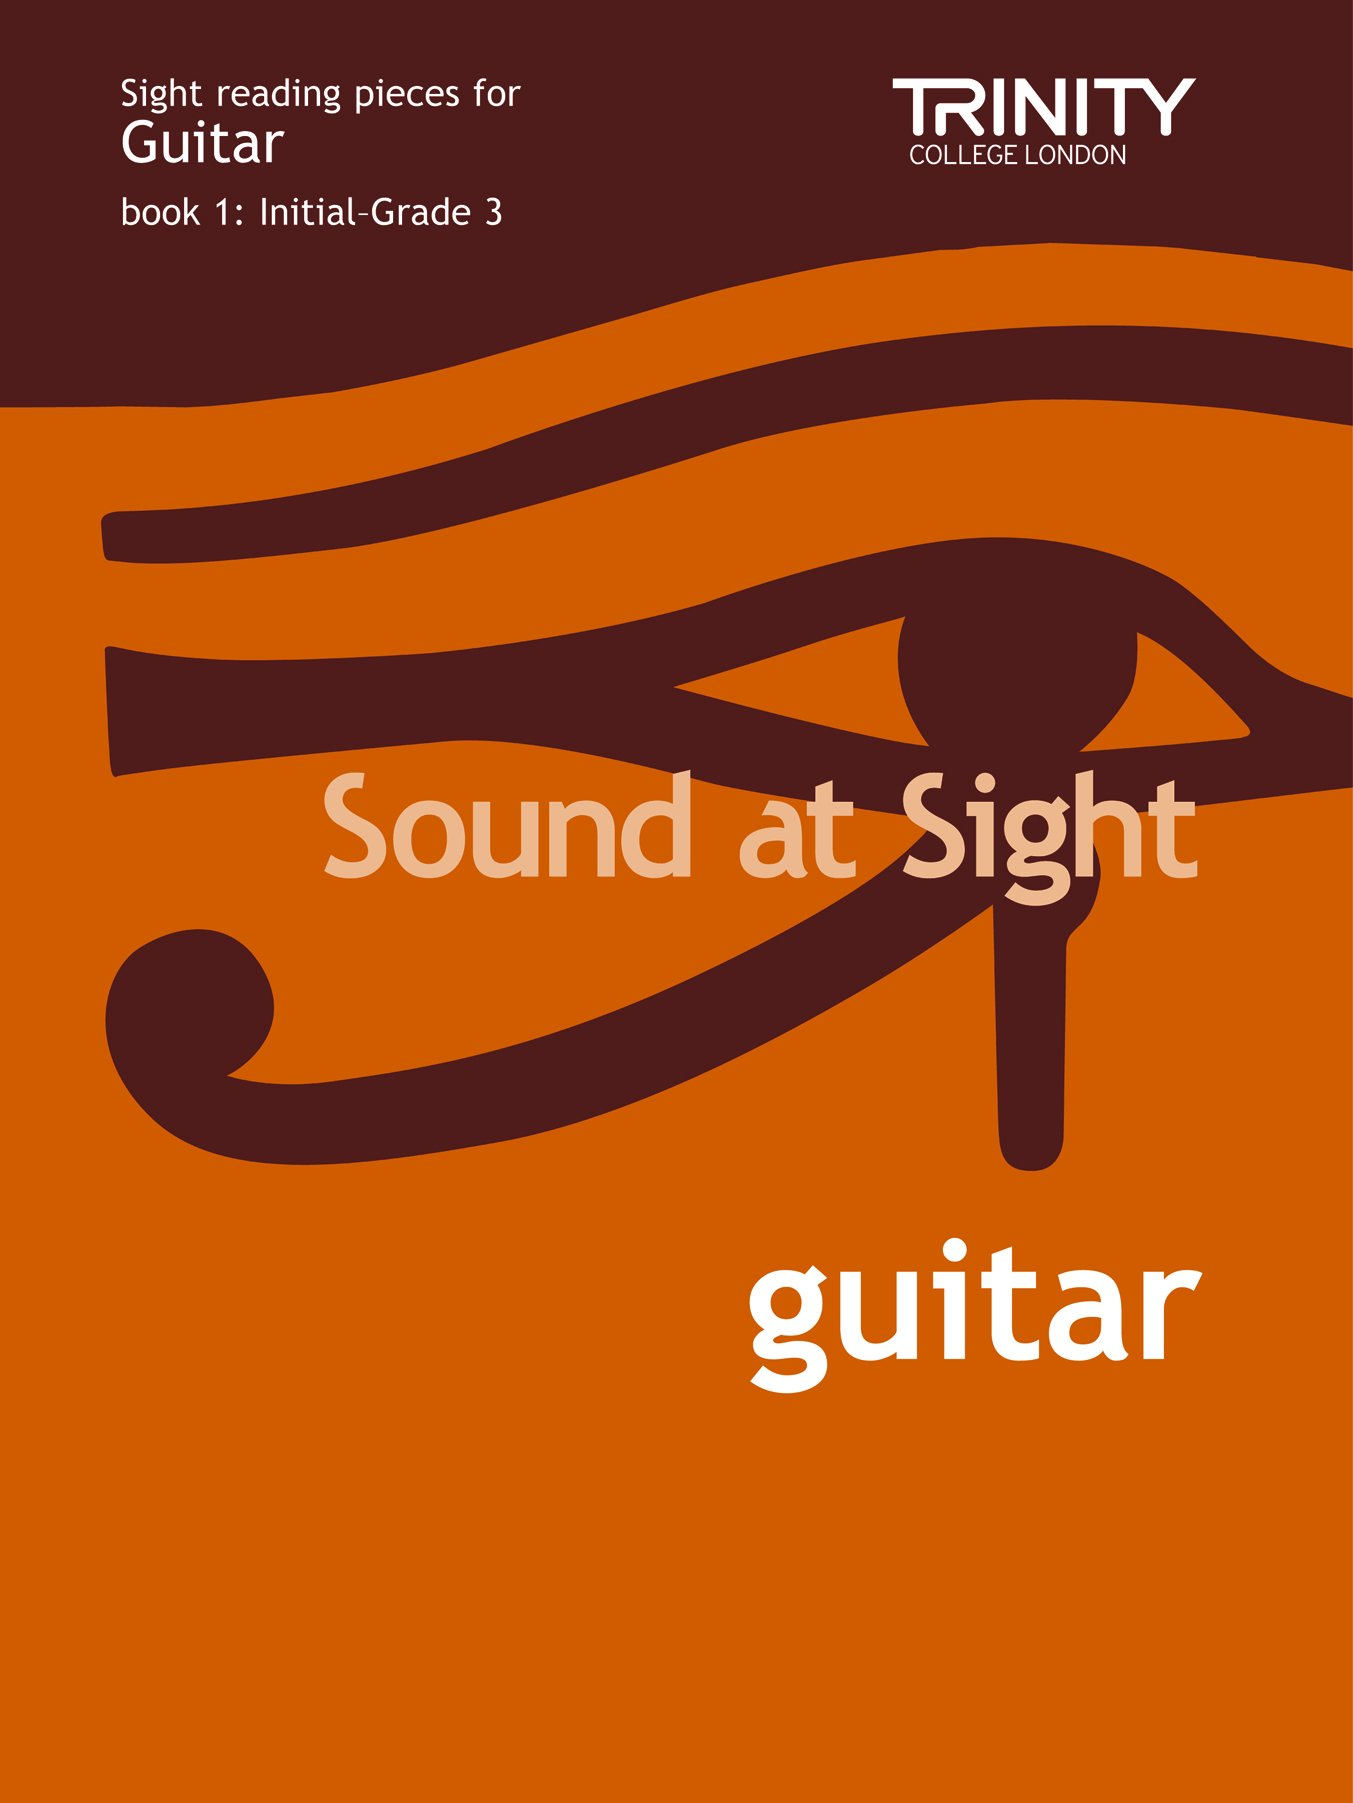 Sound At Sight Guitar (Initial-Grade 3) [Sound at Sight]